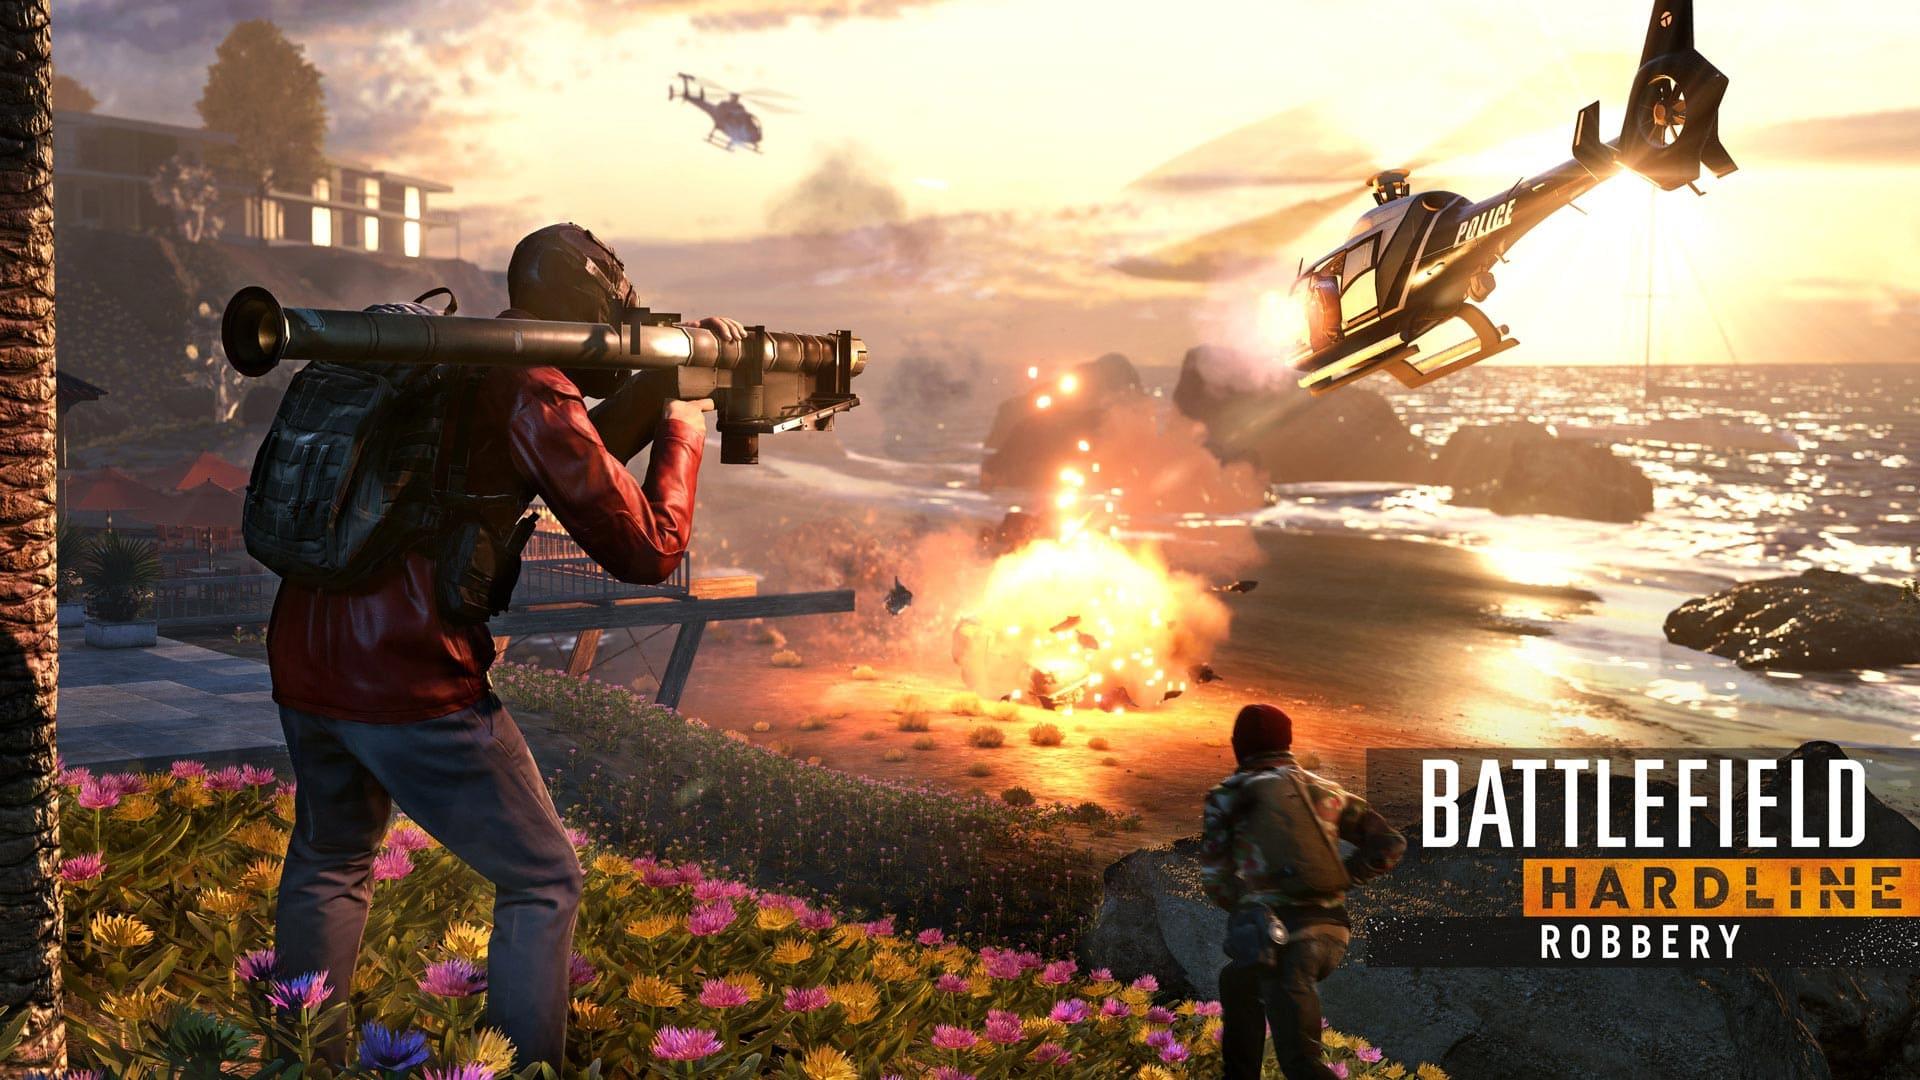 Battlefield Hardline Wallpaper Download 1080p Hd 40 Pics